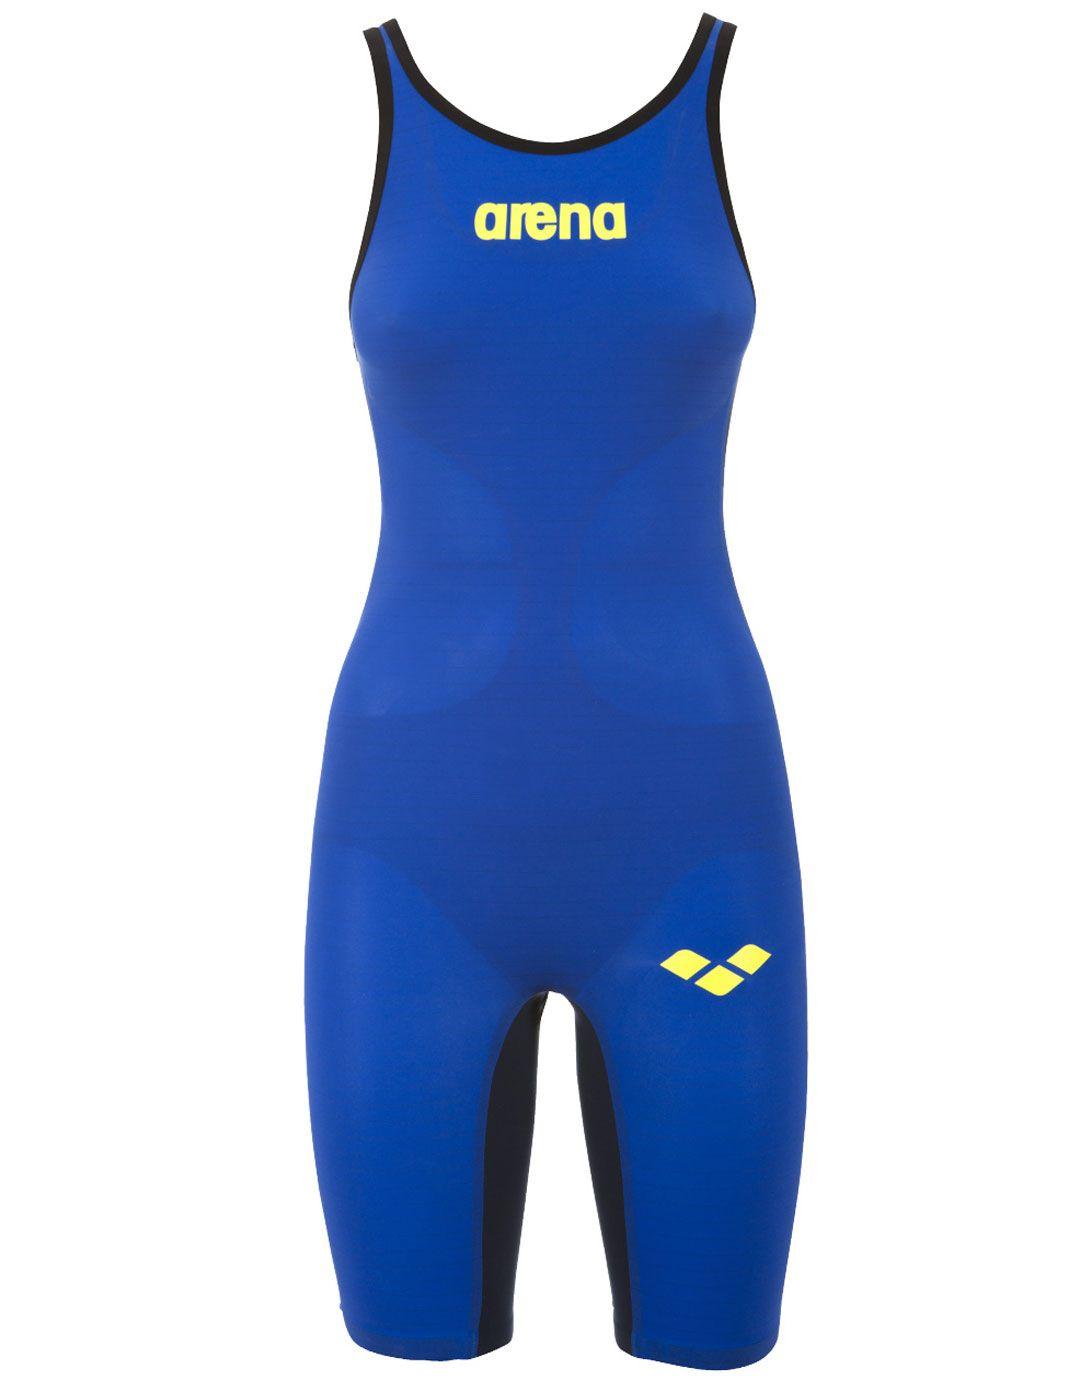 47292e3b6b5 Arena Powerskin Carbon Air Full Body Short Leg - Electric Blue ...